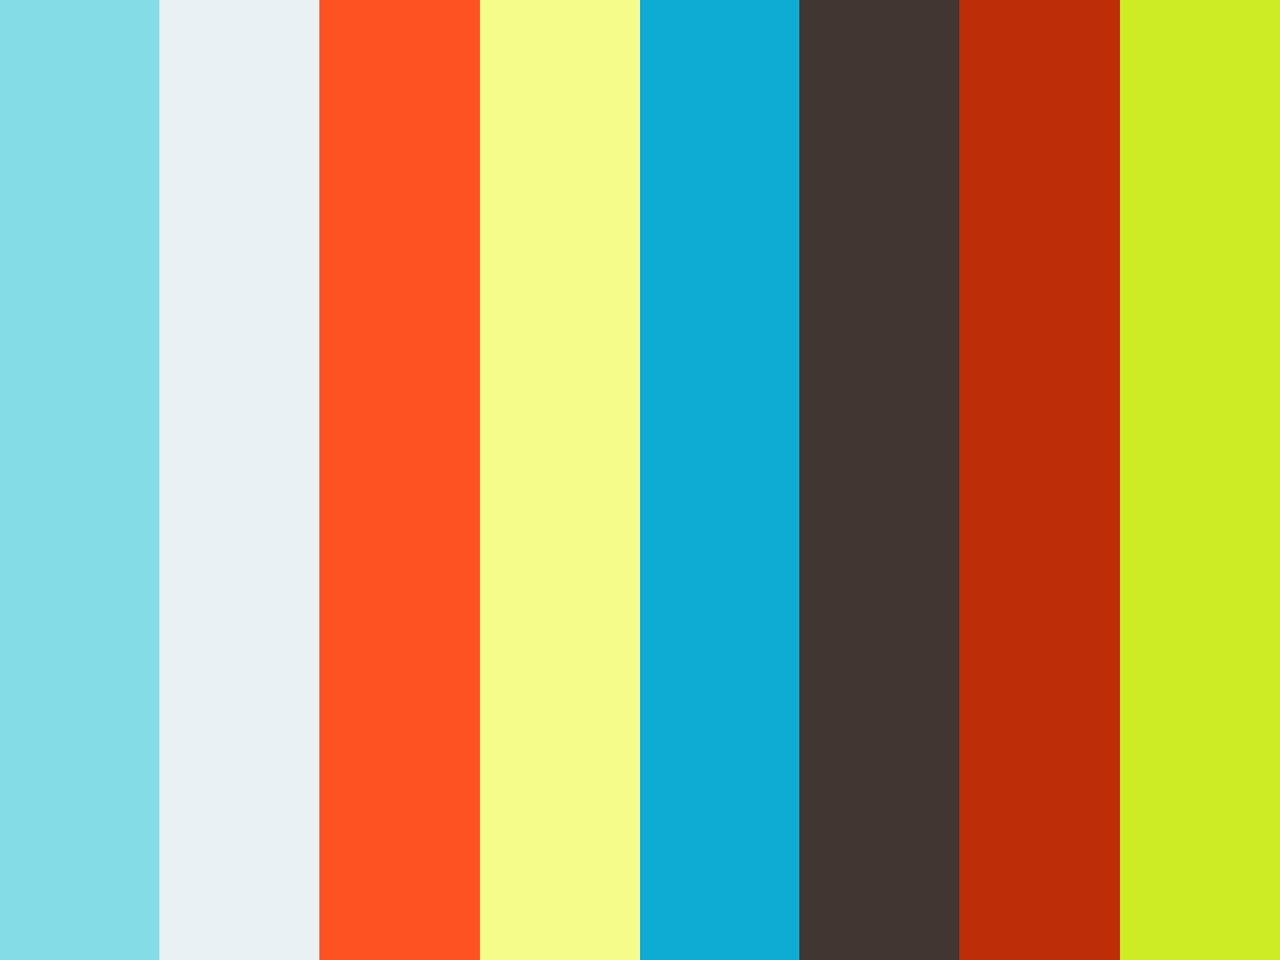 Rainbow Serpent - Elements 18